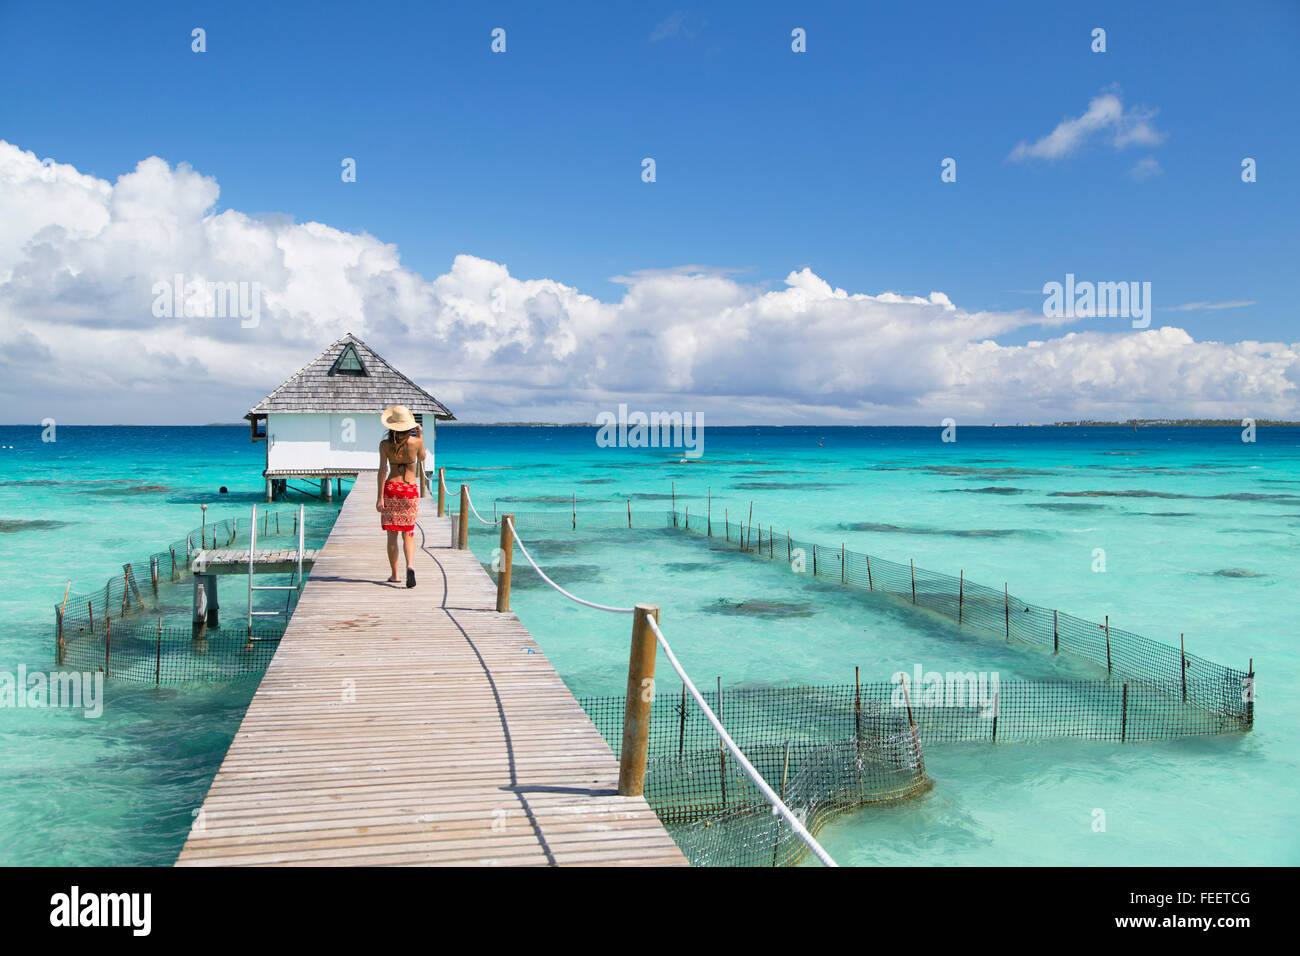 Woman walking on jetty, Fakarava, Tuamotu Islands, French Polynesia - Stock Image